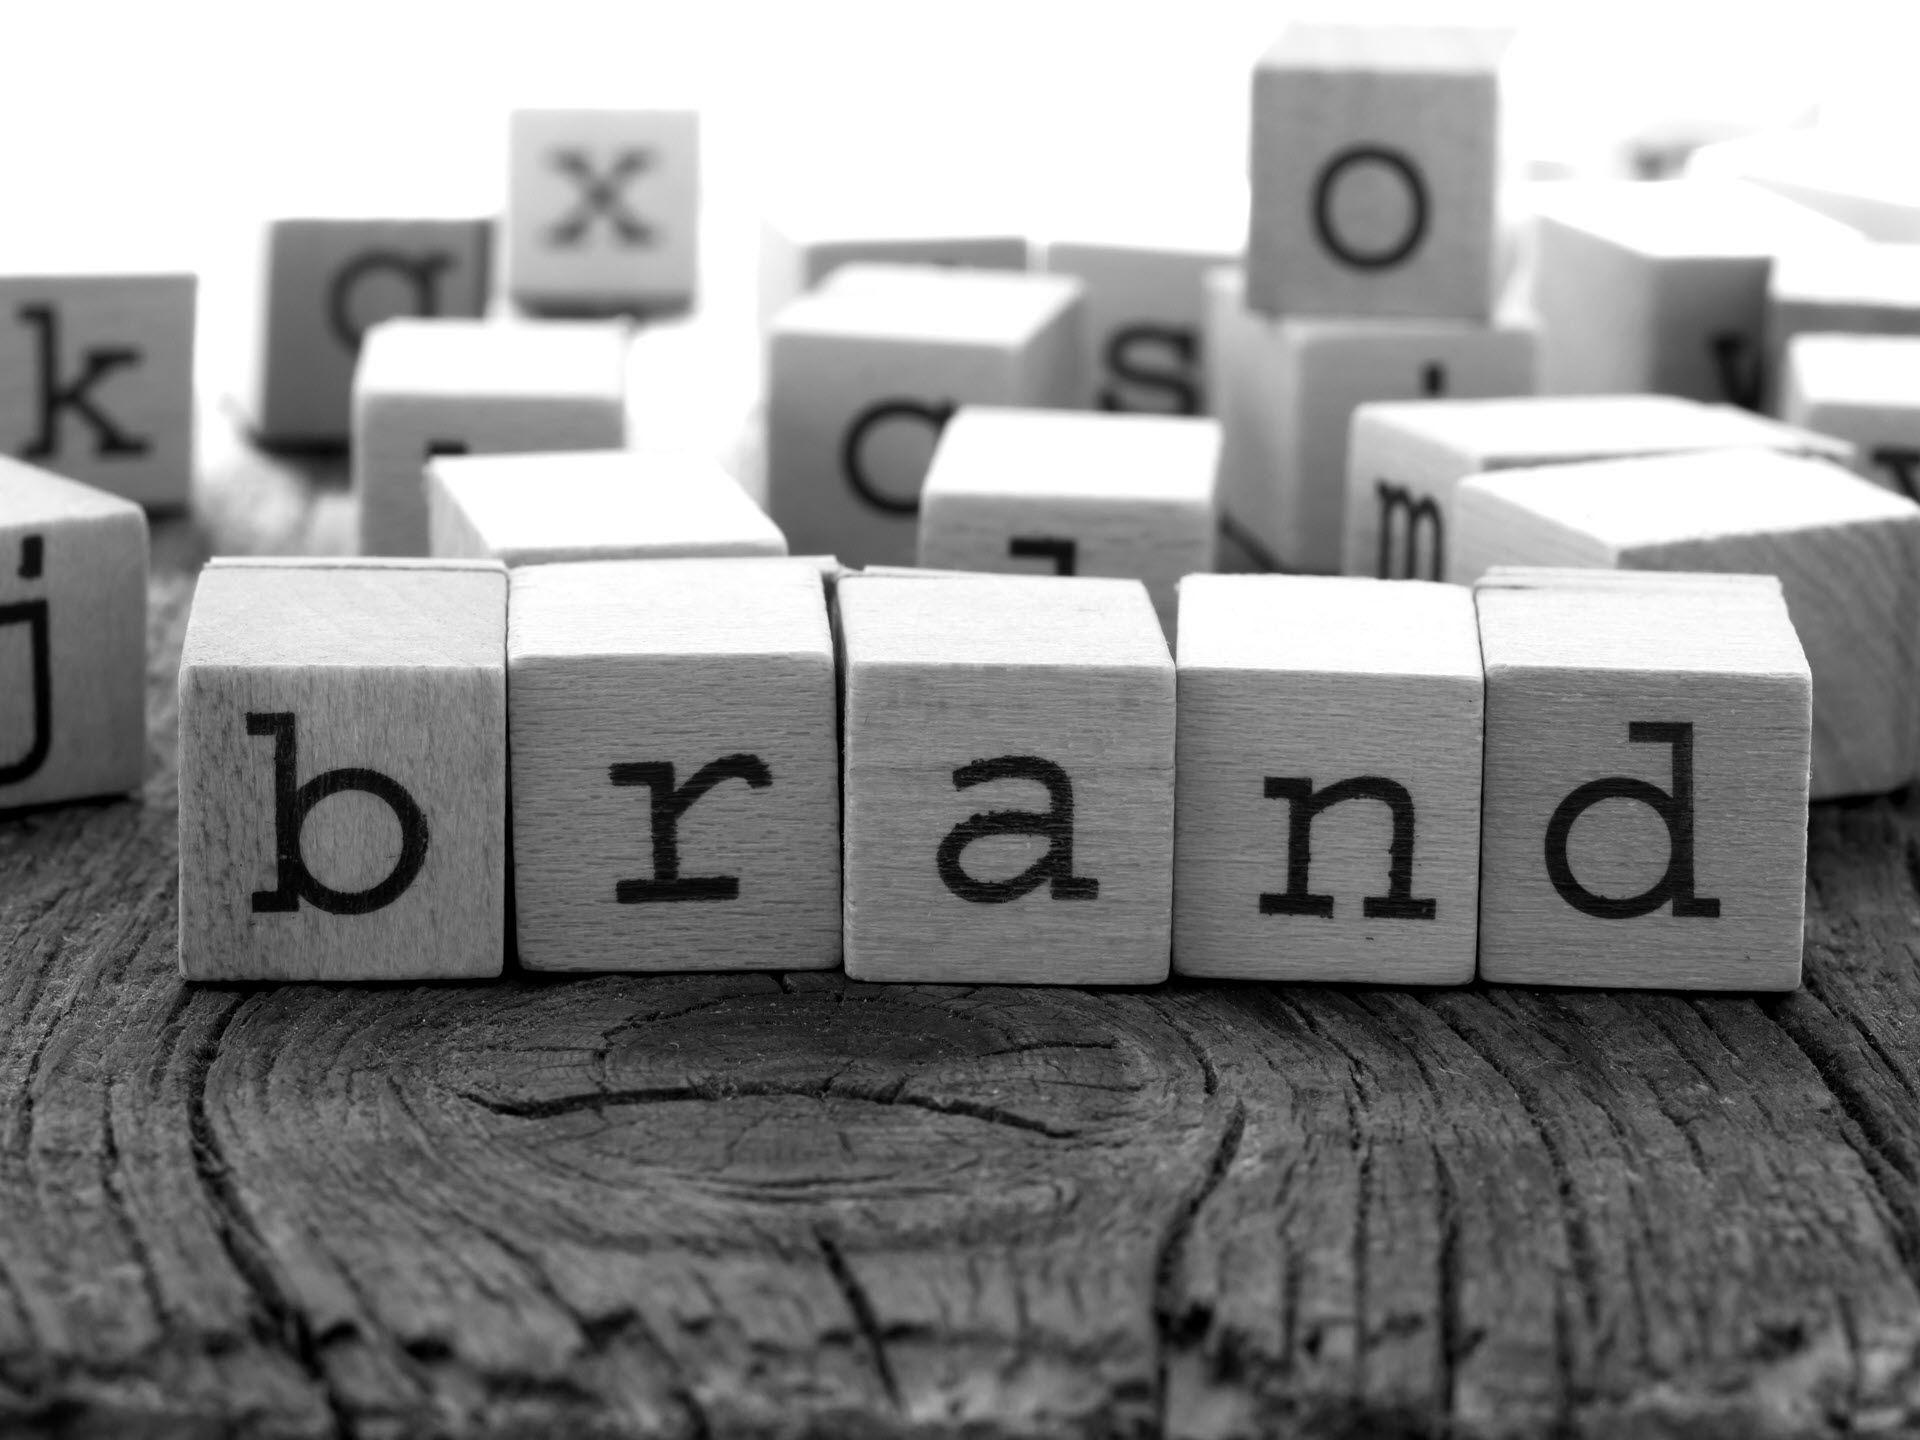 Will The Gillette Ad Hurt The Brand's Credibility?